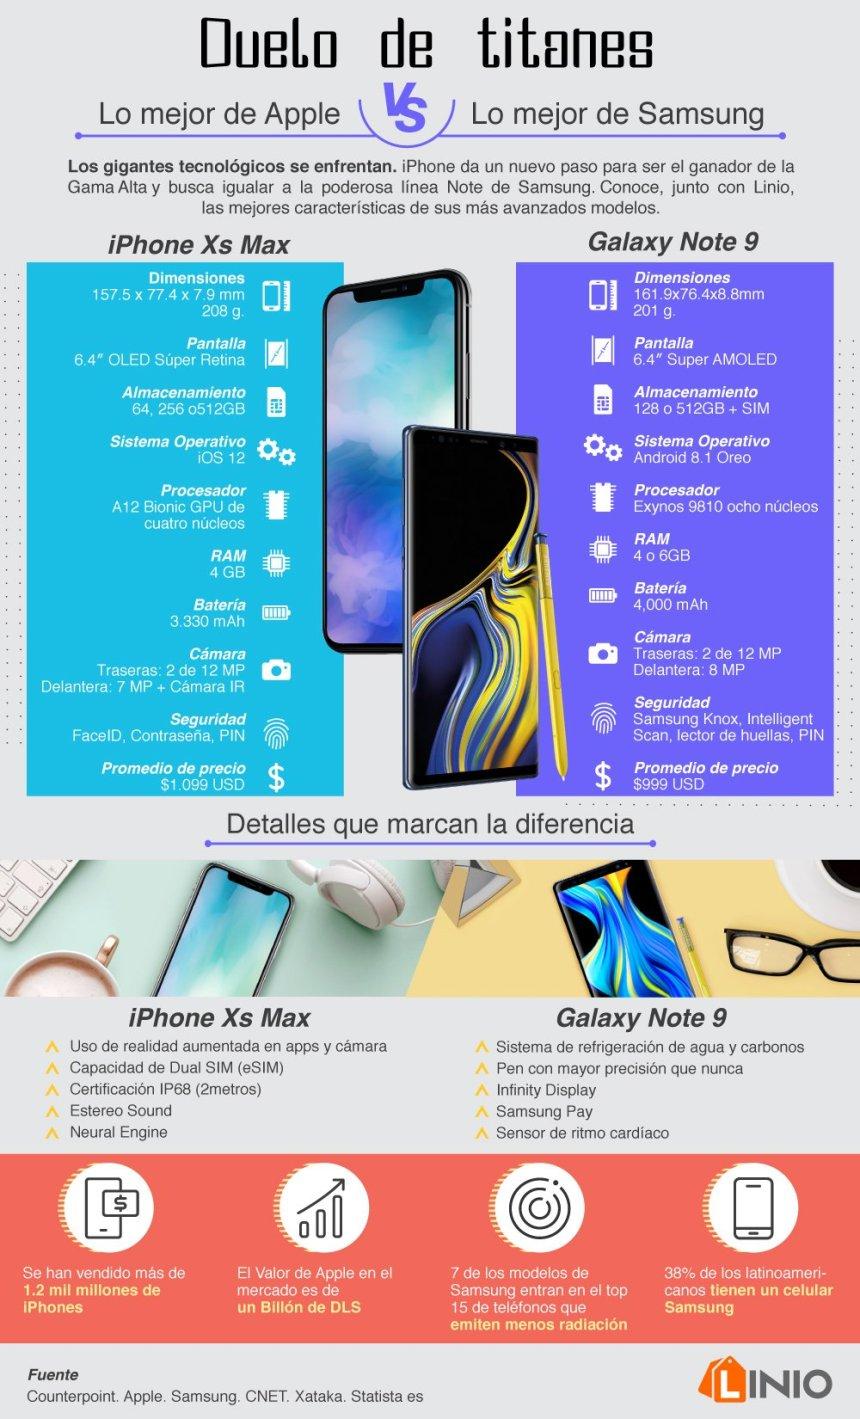 iPhone Xs Max vs Galaxy Note 9